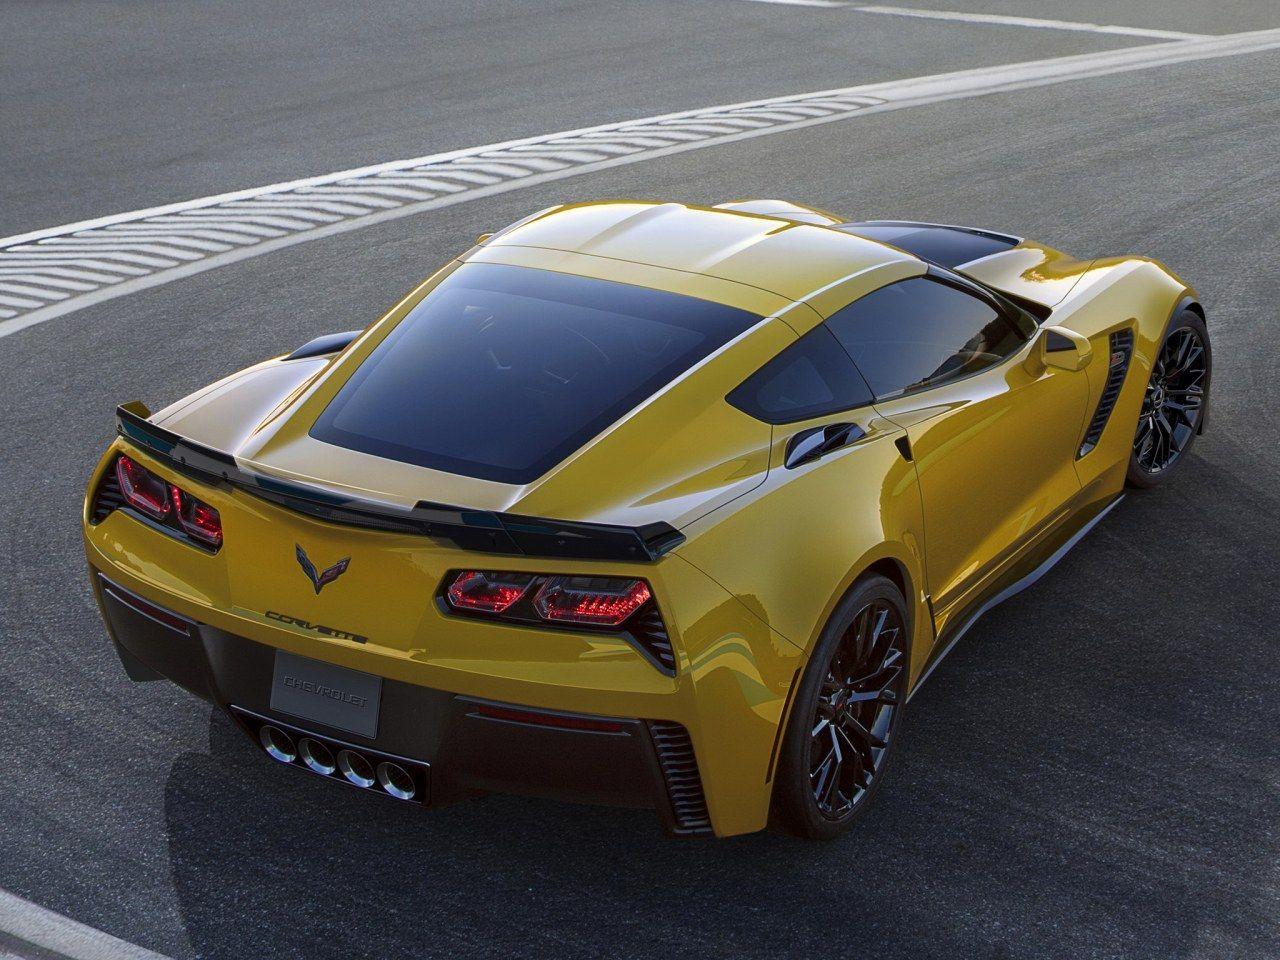 Corvette Z06 Moet Gehakt Maken Van Duitse En Italiaanse Concurrentie Drivessential Corvette Chevrolet Corvette Supercars